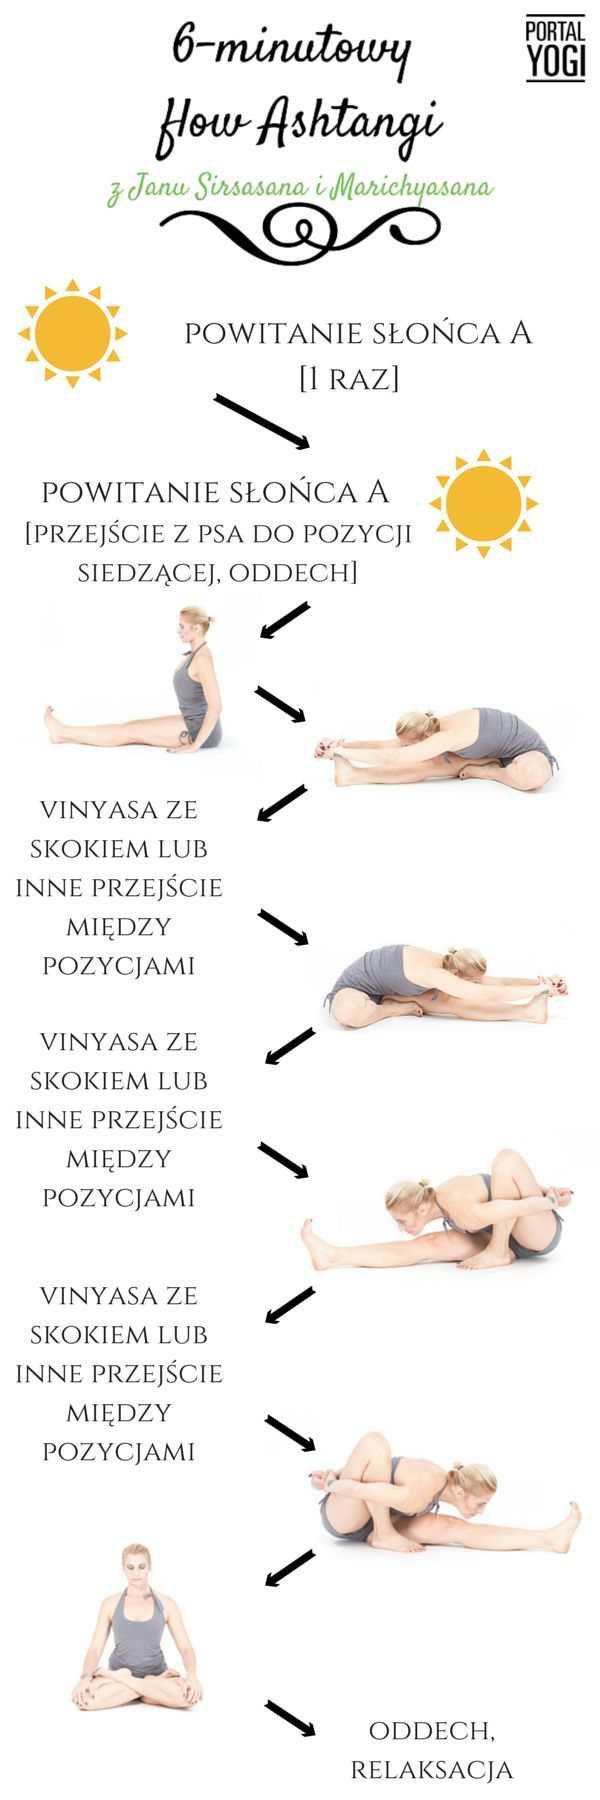 6-minutowy flow Jogi Ashtanga z Janu Sirasana i Marichyasana. #joga #jogawdomu #portalyogi